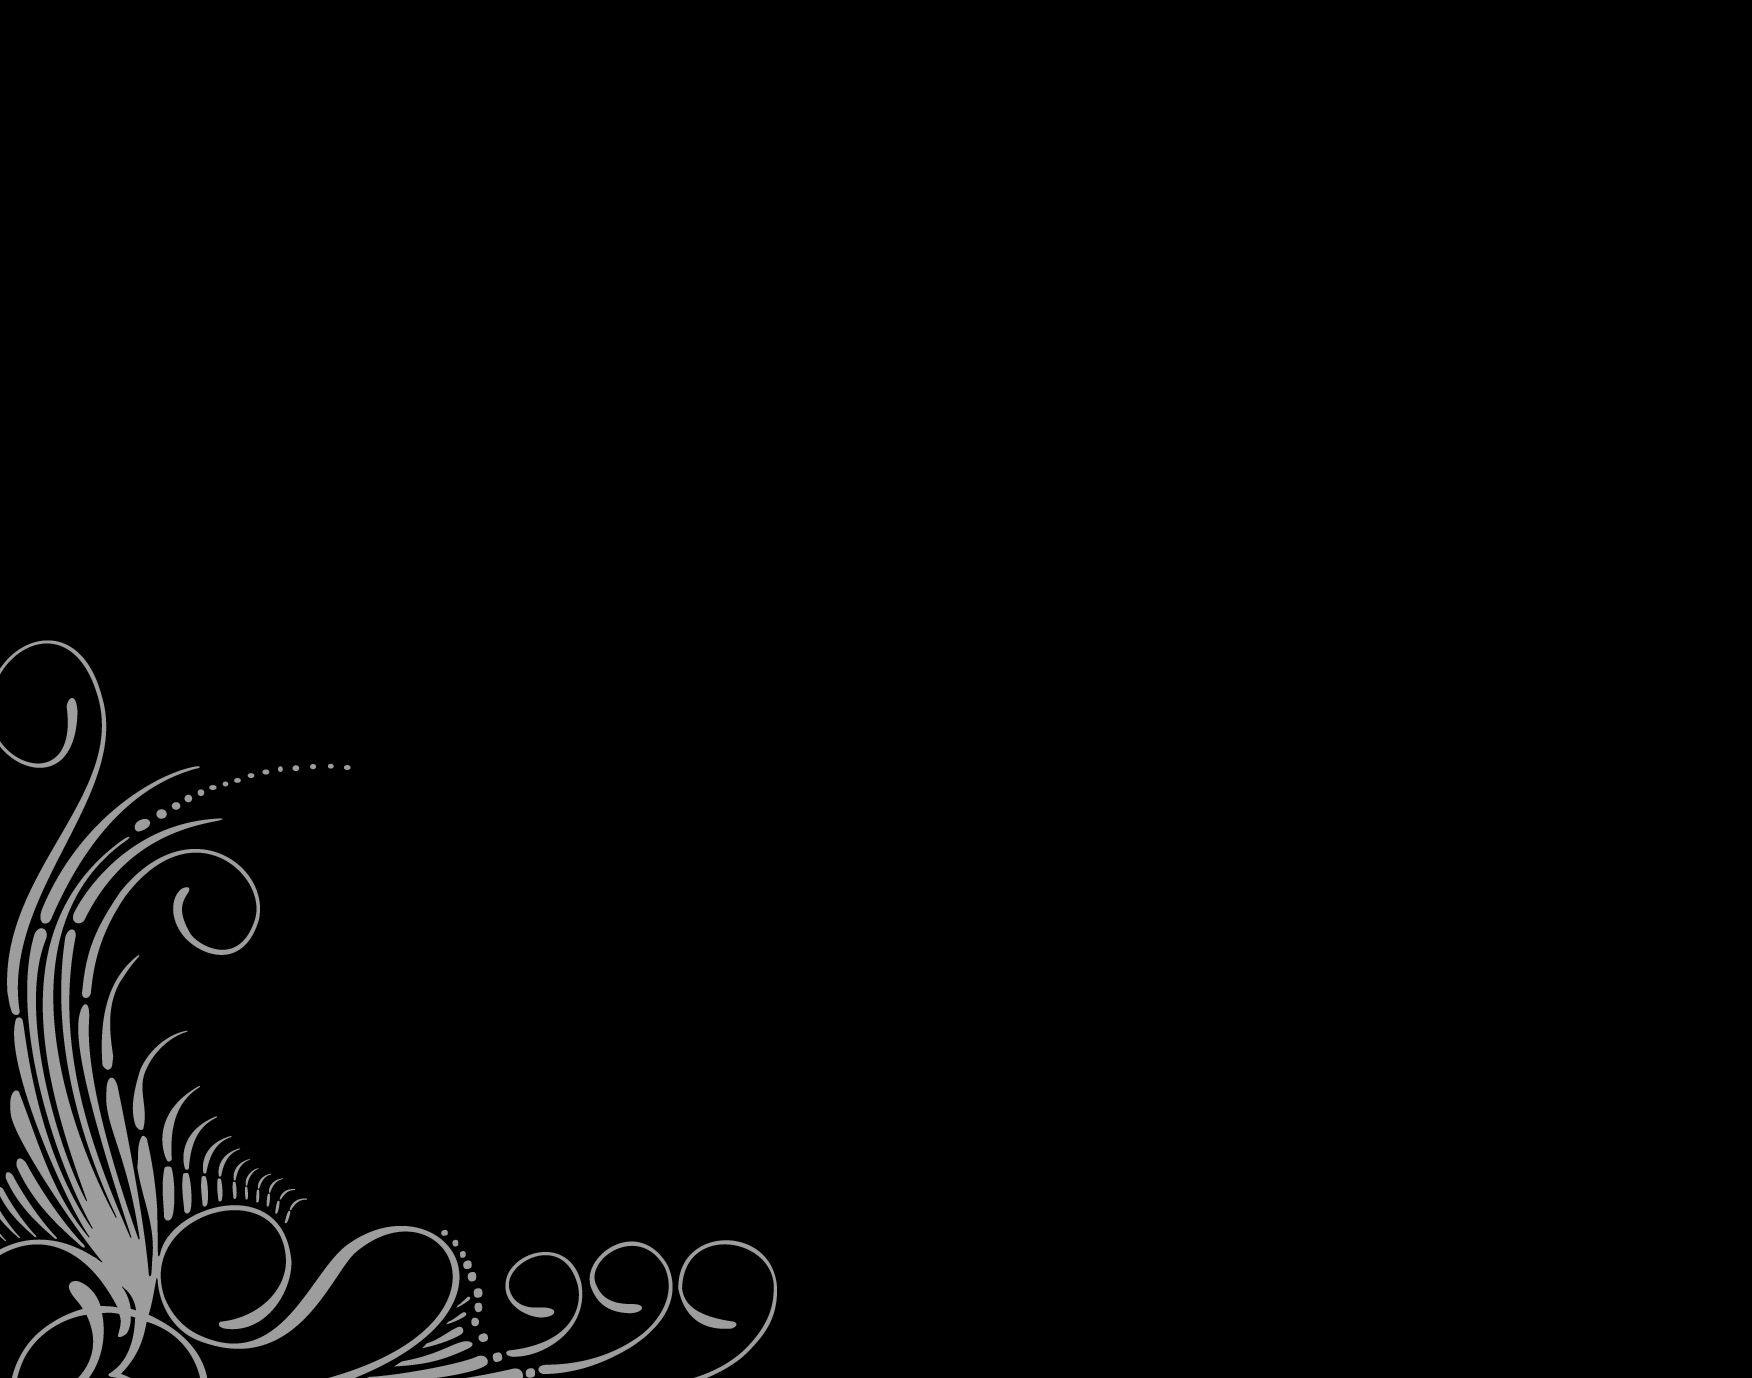 Elegant Black Border Ppt Backgrounds For Microsoft Powerpoint Cool Black Wallpaper Black Phone Wallpaper Background Ppt